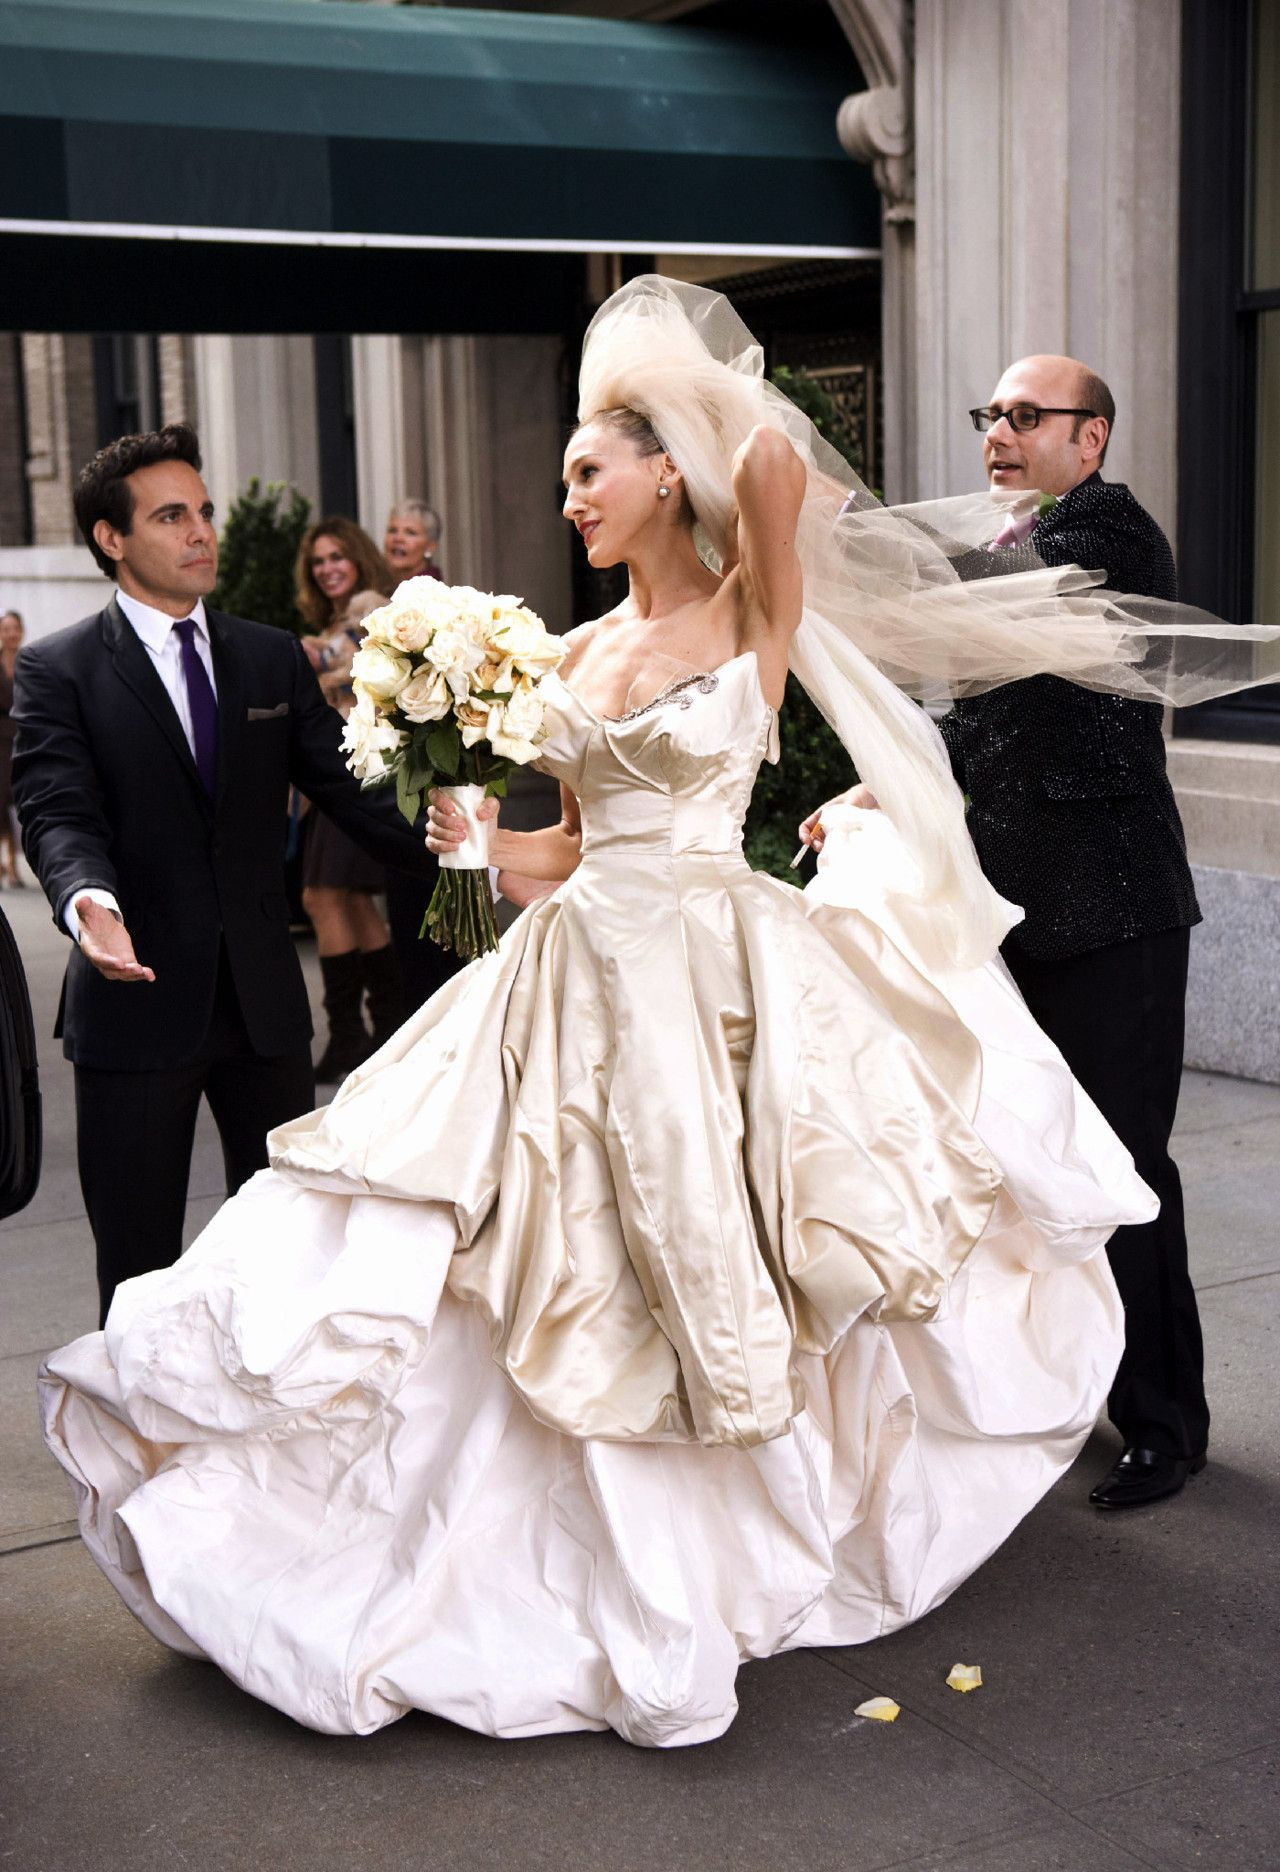 Victoria Swarovski Hochzeitskleid Preis